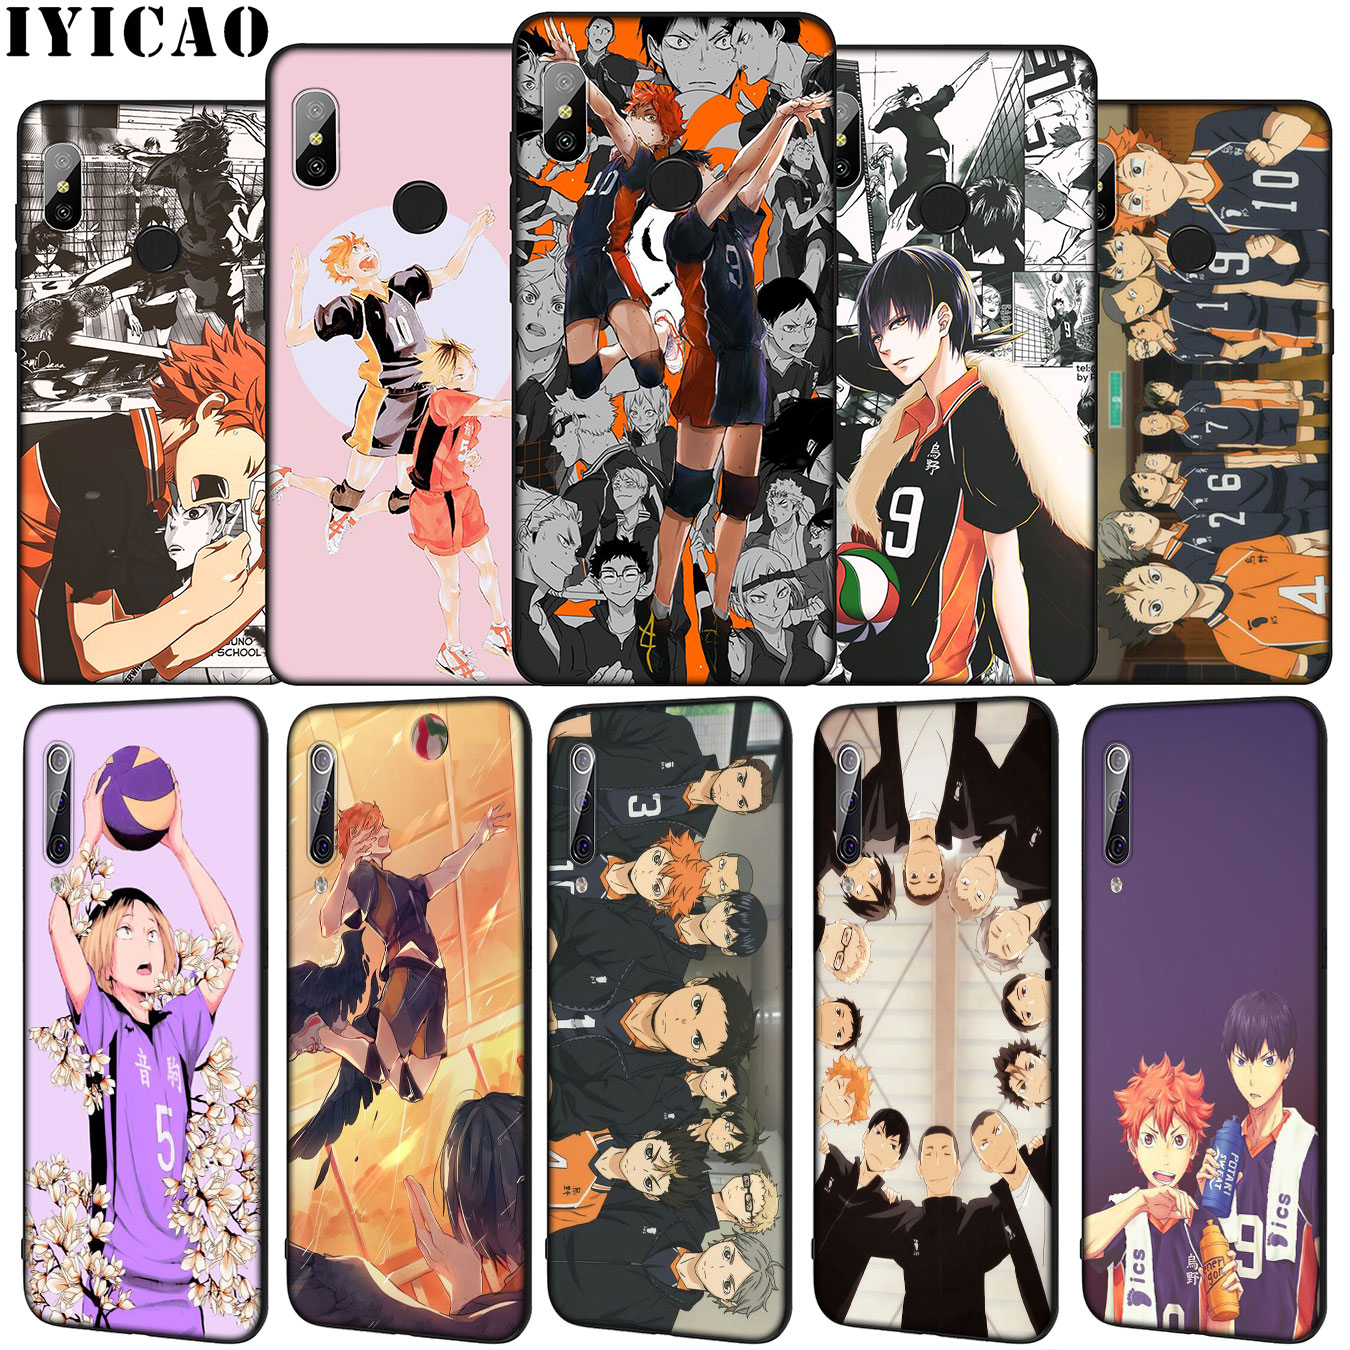 IYICAO Haikyuu Hinata Soft Silicone Phone Case for Xiaomi Mi 10 9 9T A3 Pro 8 SE A2 Lite A1 CC9 CC9E 6 pocophone f1 Mi10 Cover